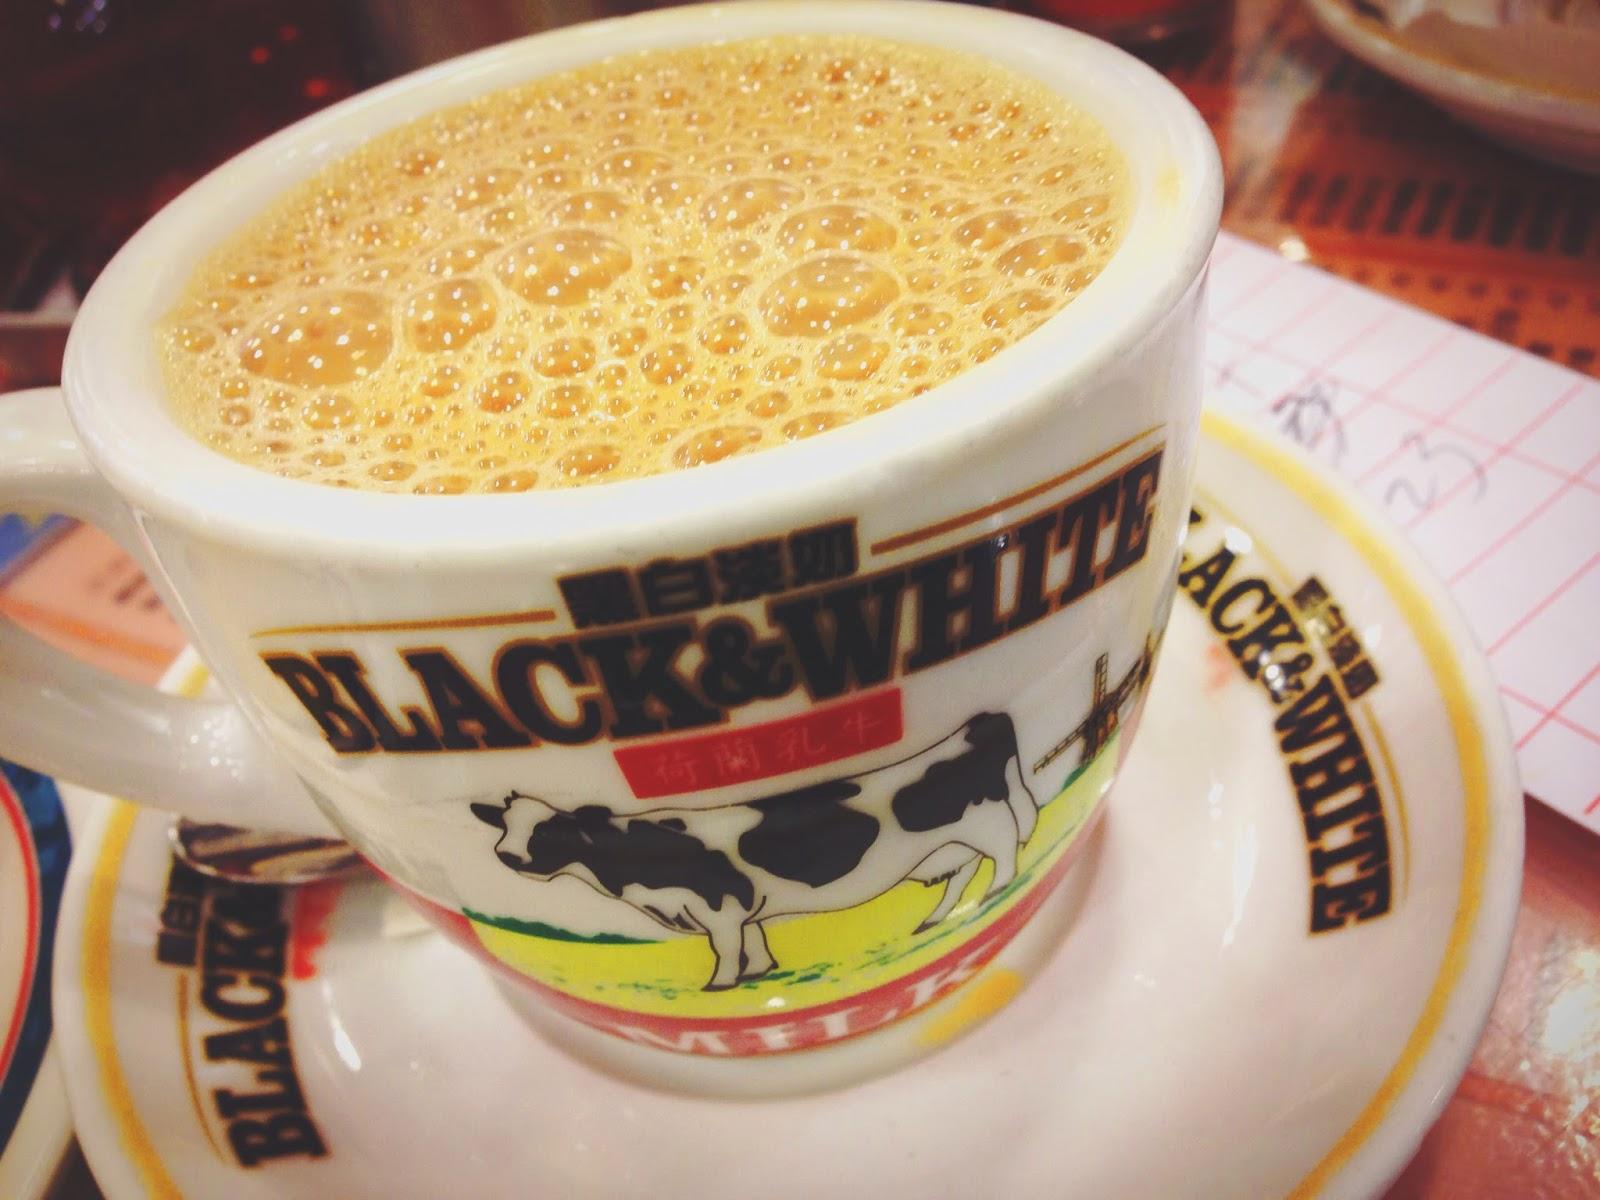 Kum Wah Cafe Hong Kong-style Milk Tea